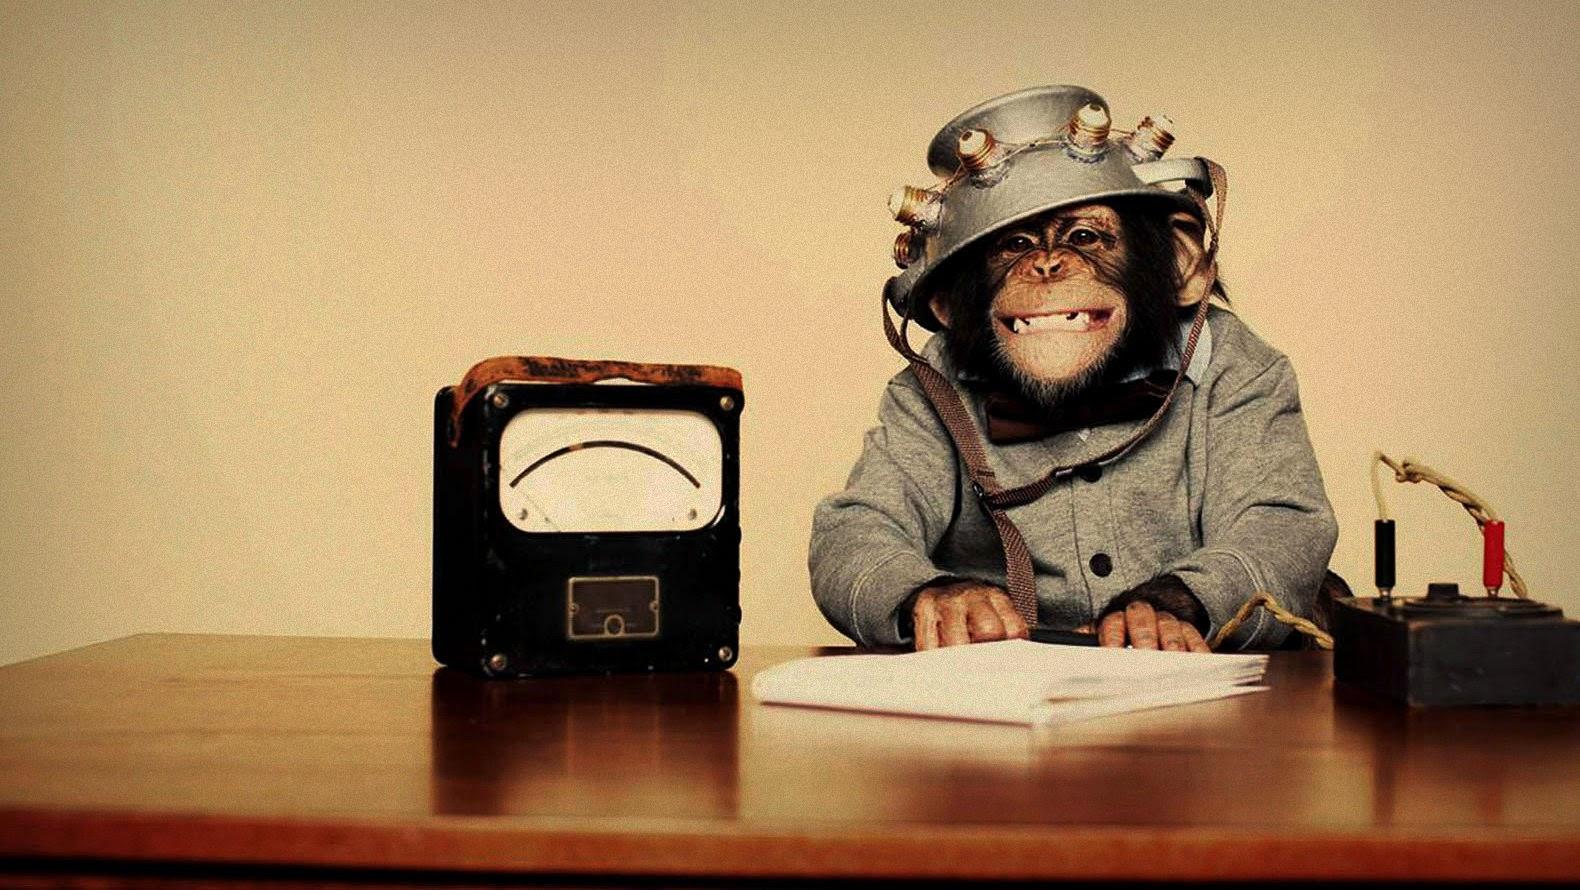 190220131044-monyet-pinter.jpg